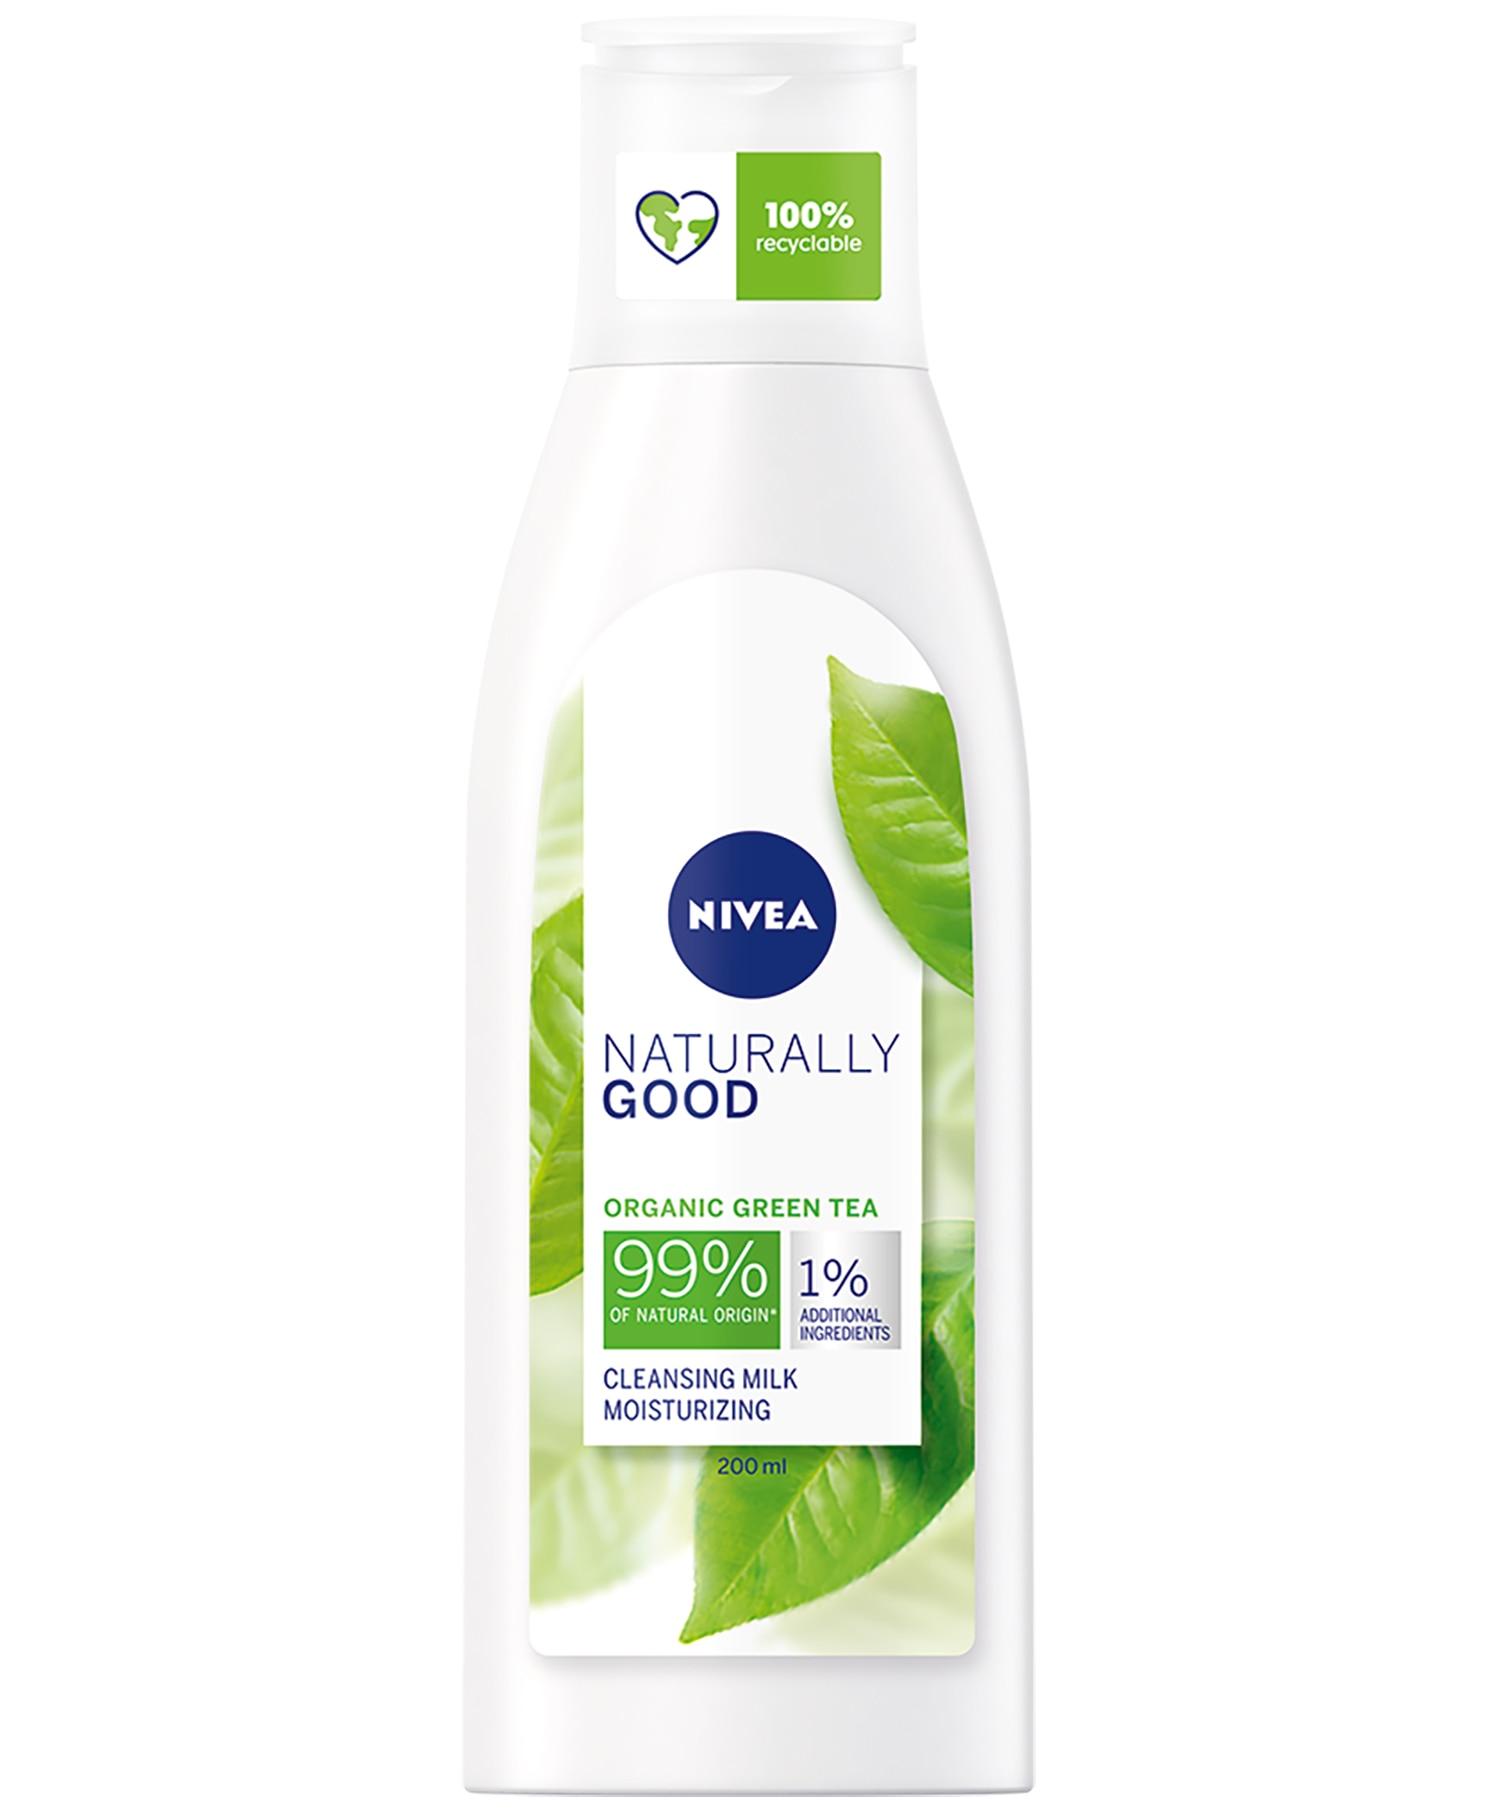 Nivea Naturally Good Cleansing Milk